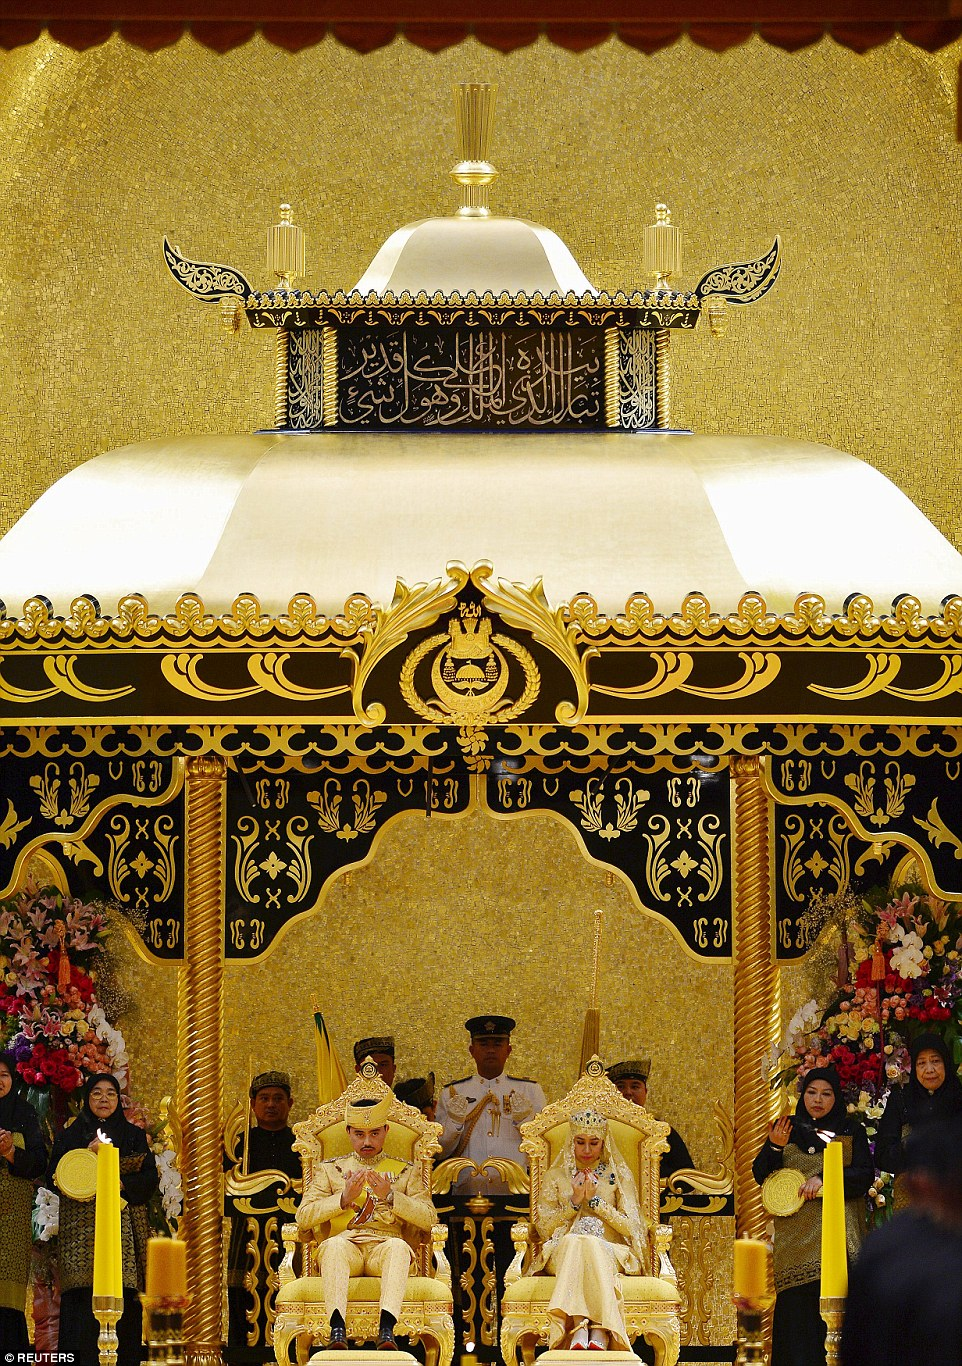 GAMBAR: Majlis Persandingan Diraja Anak Sultan Brunei